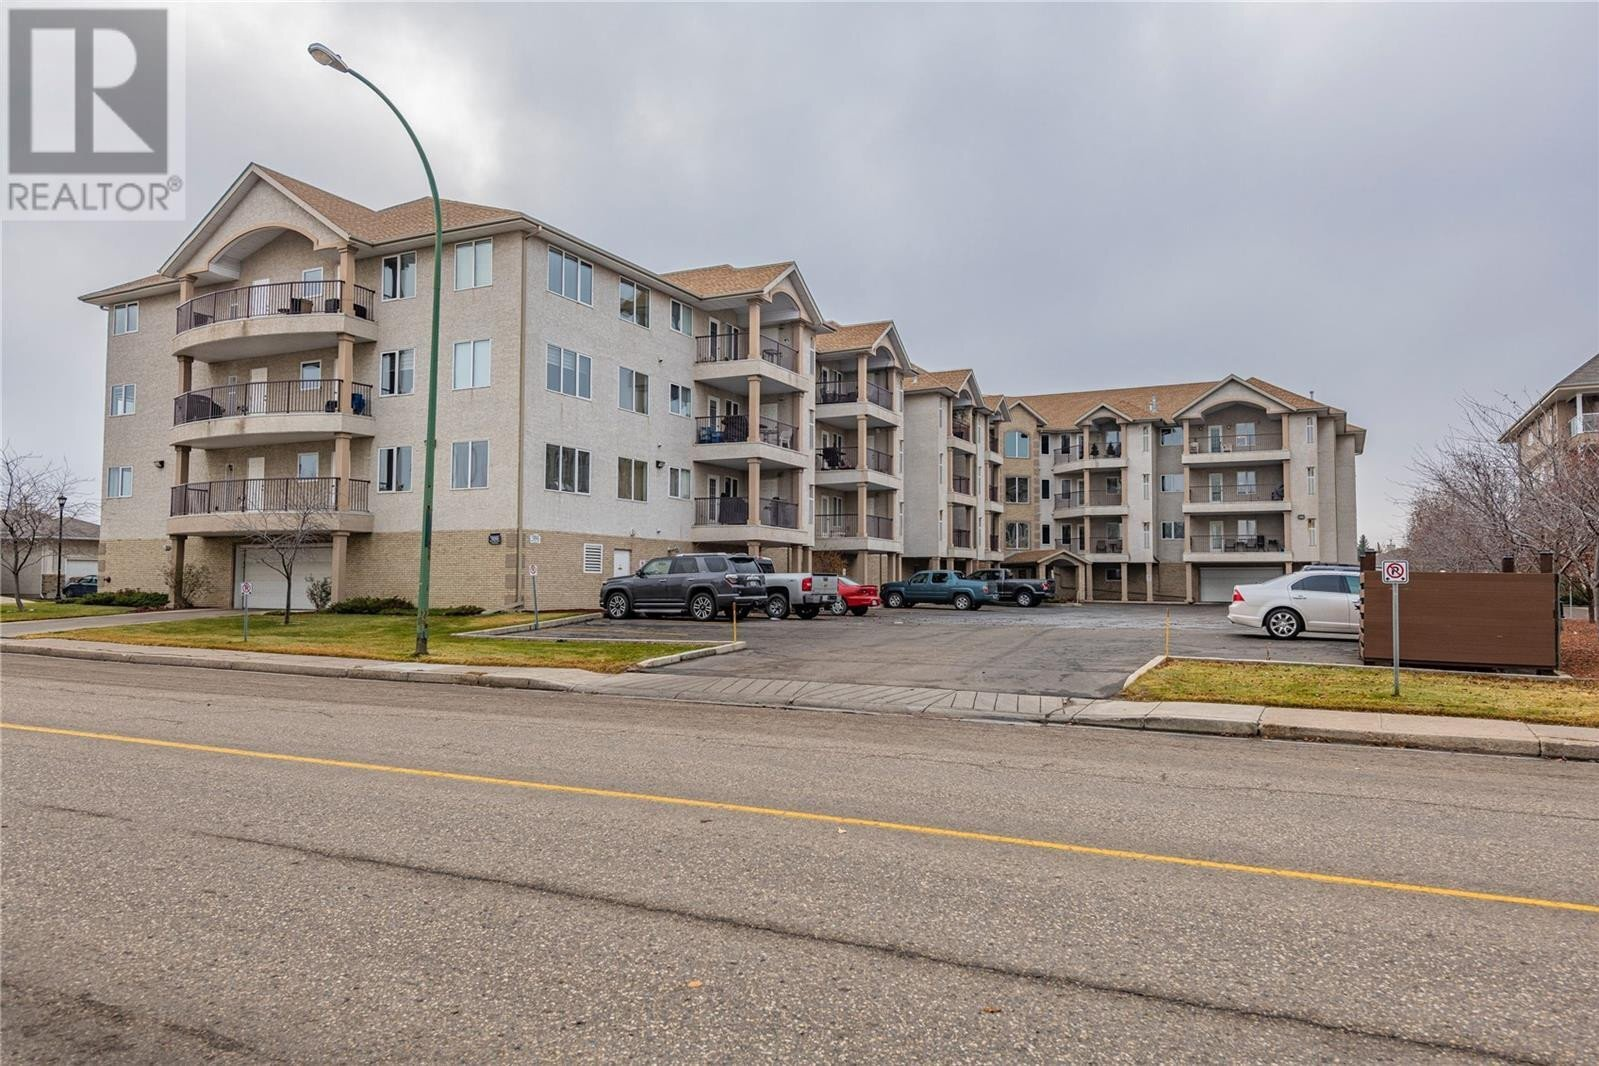 Condo for sale at 2909 Arens Rd E Unit 207 Regina Saskatchewan - MLS: SK831766